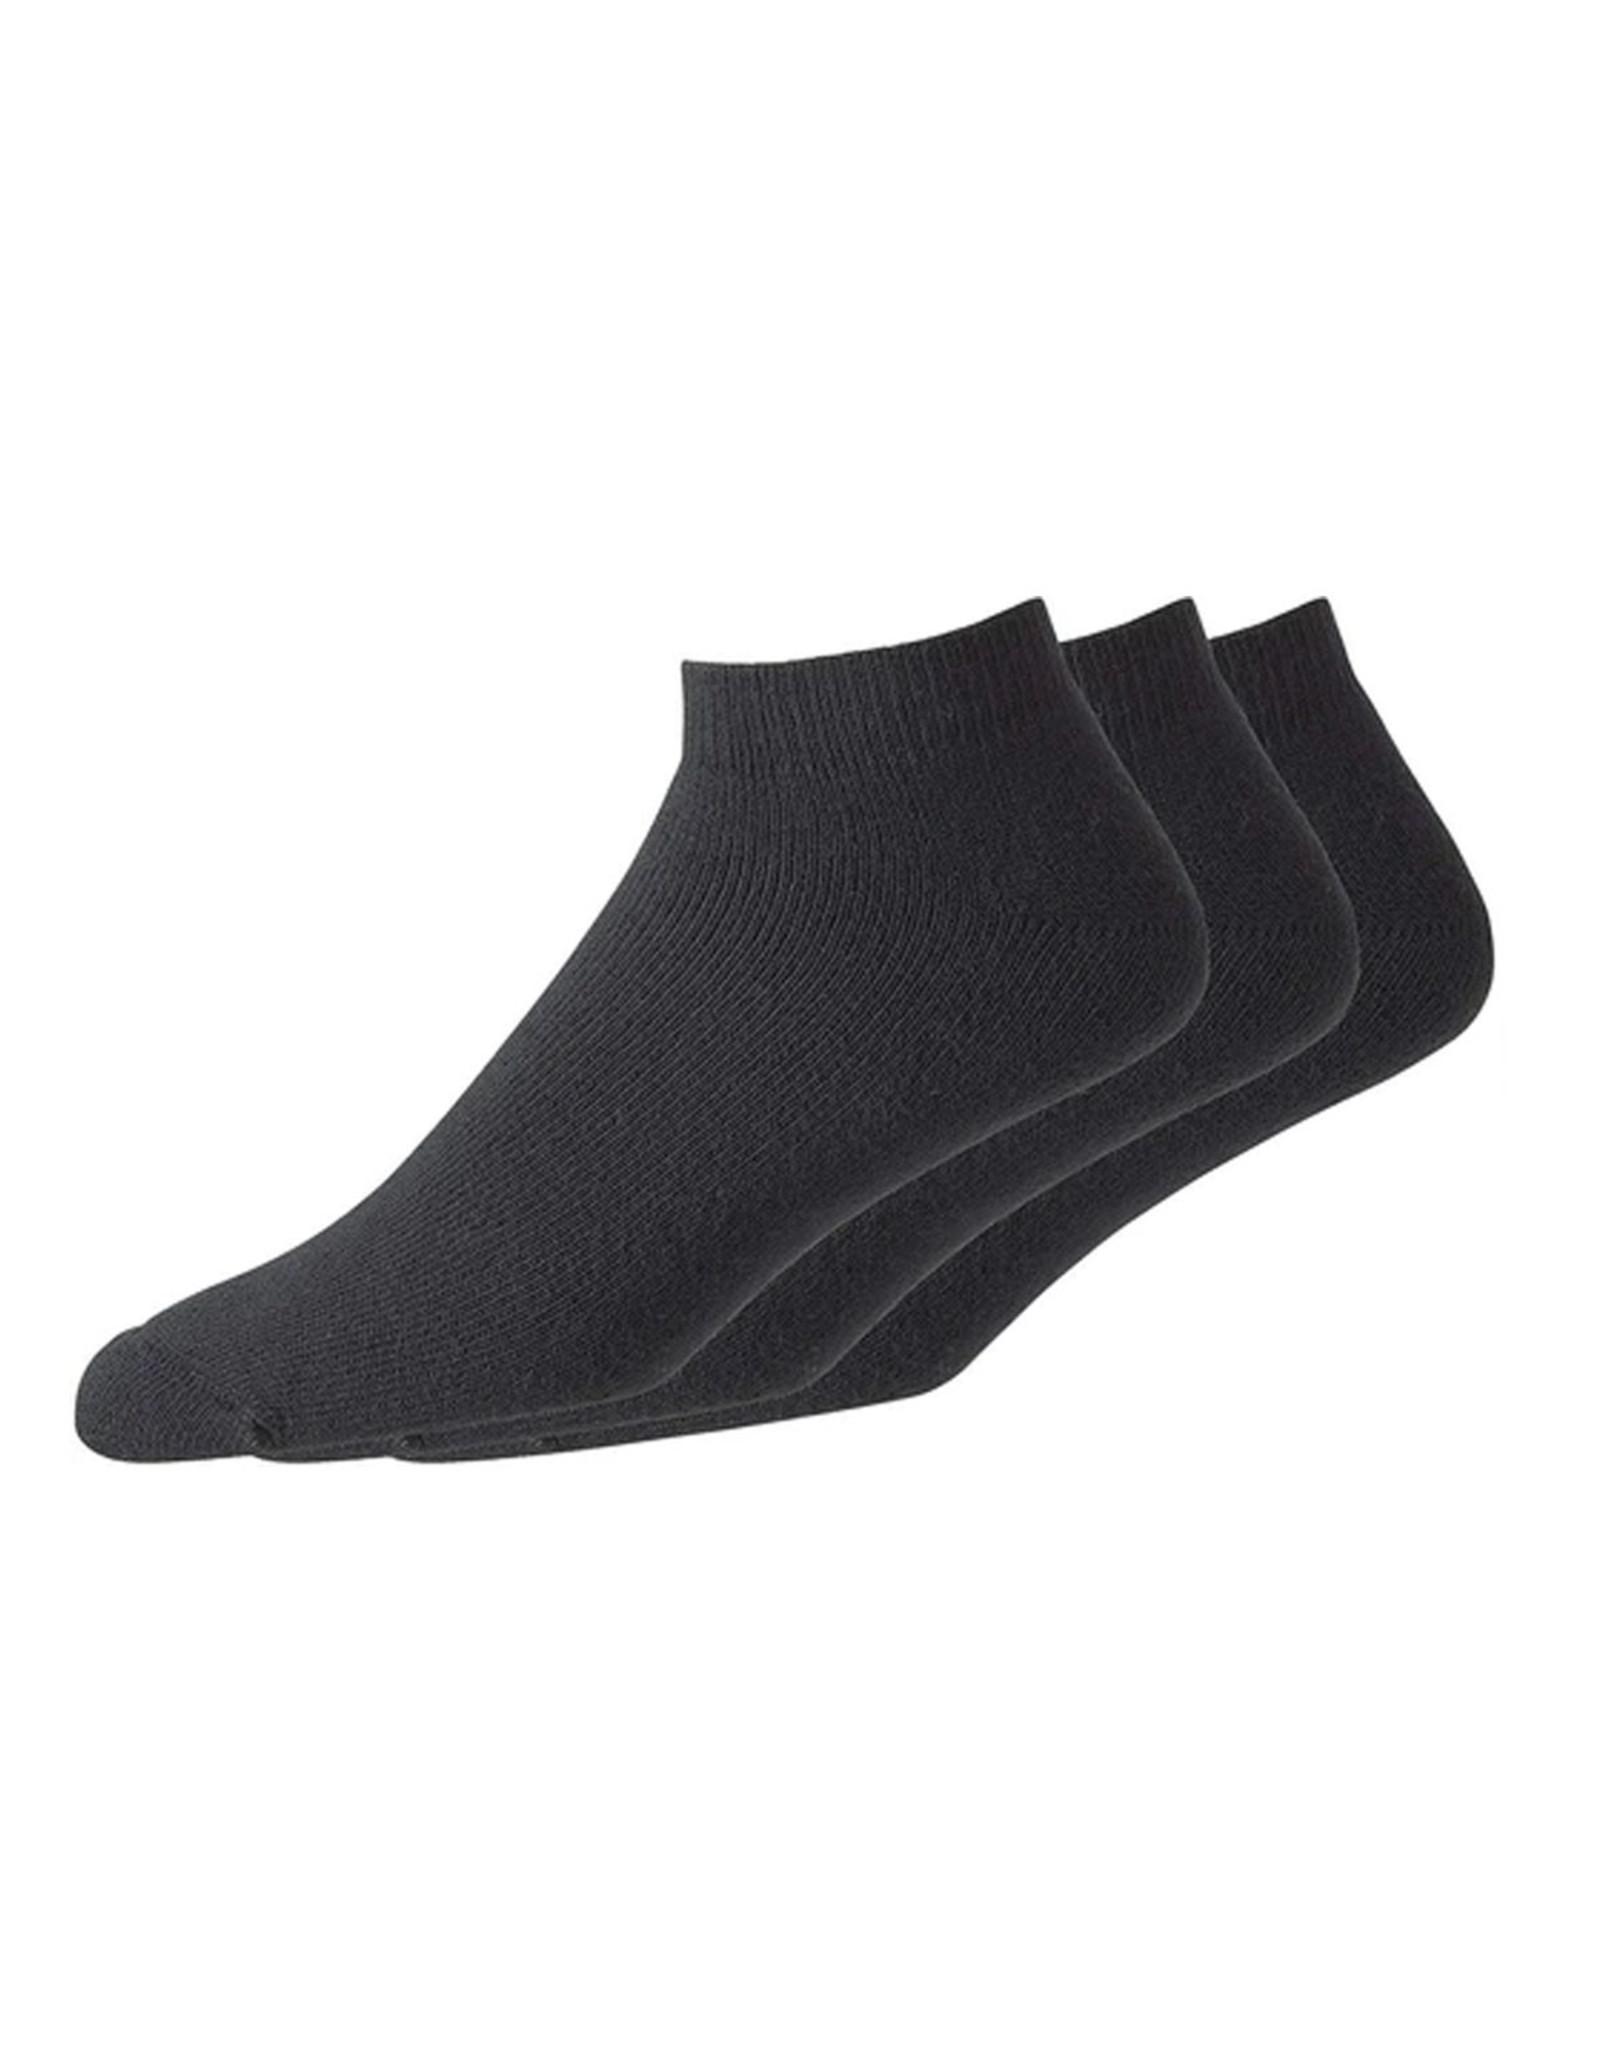 FootJoy FootJoy ComfortSof Socks